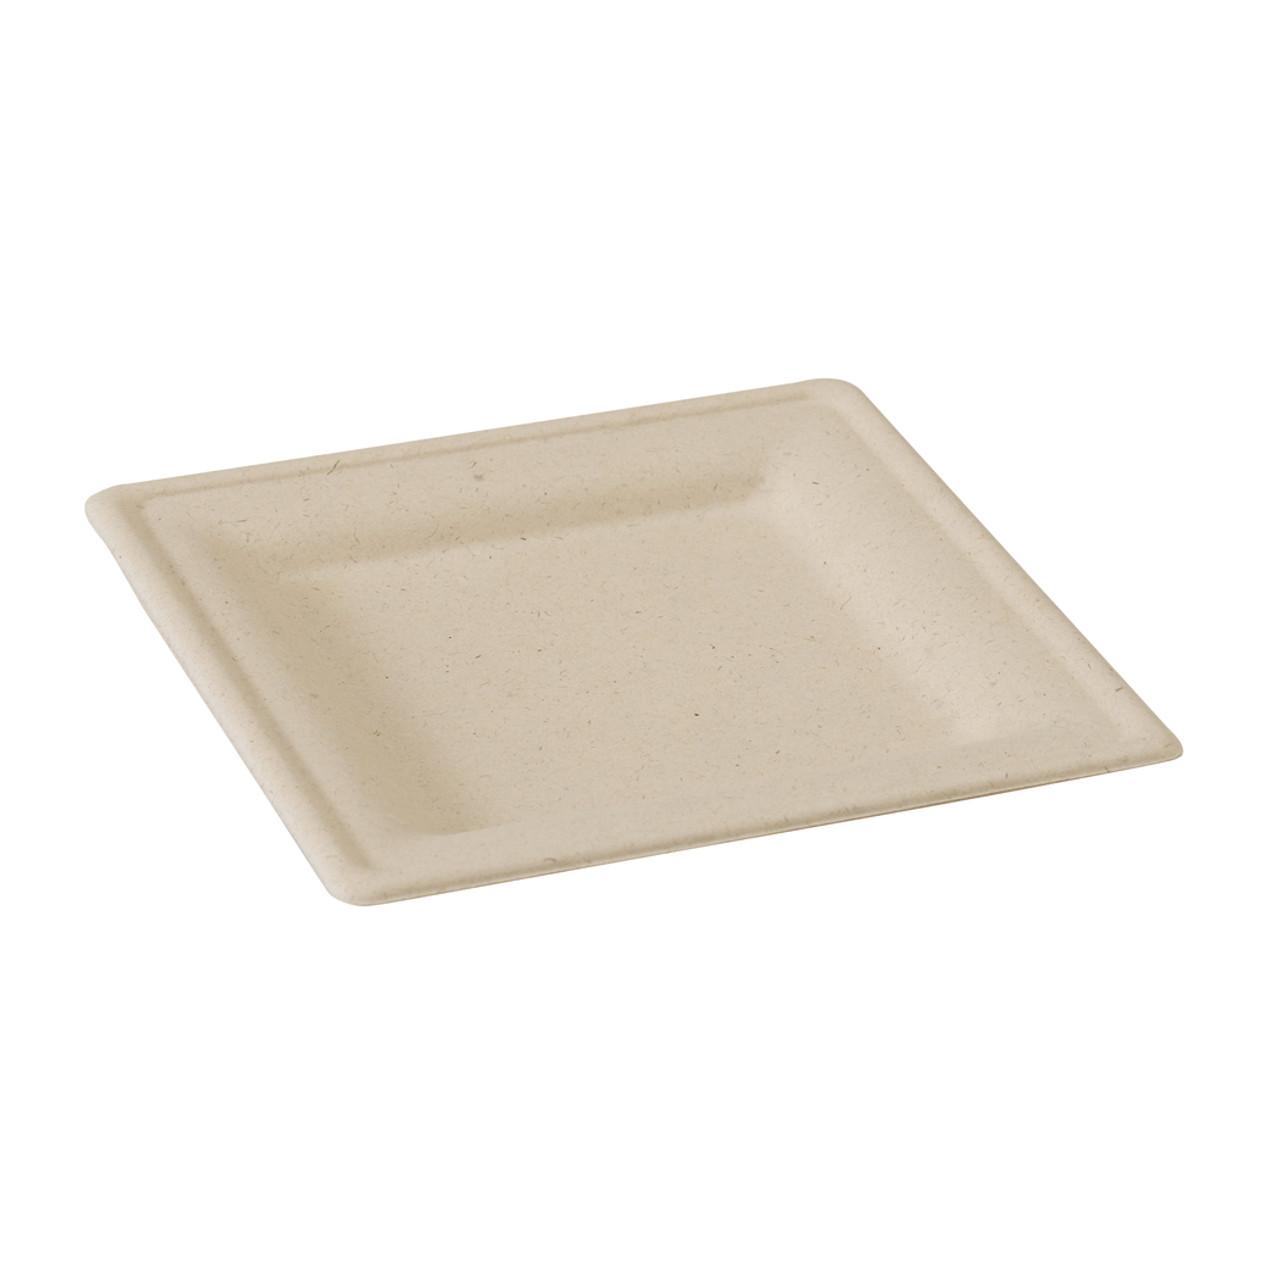 Square Brown Sugarcane Plate - L:7.8 x W:7.8 x H:.6in